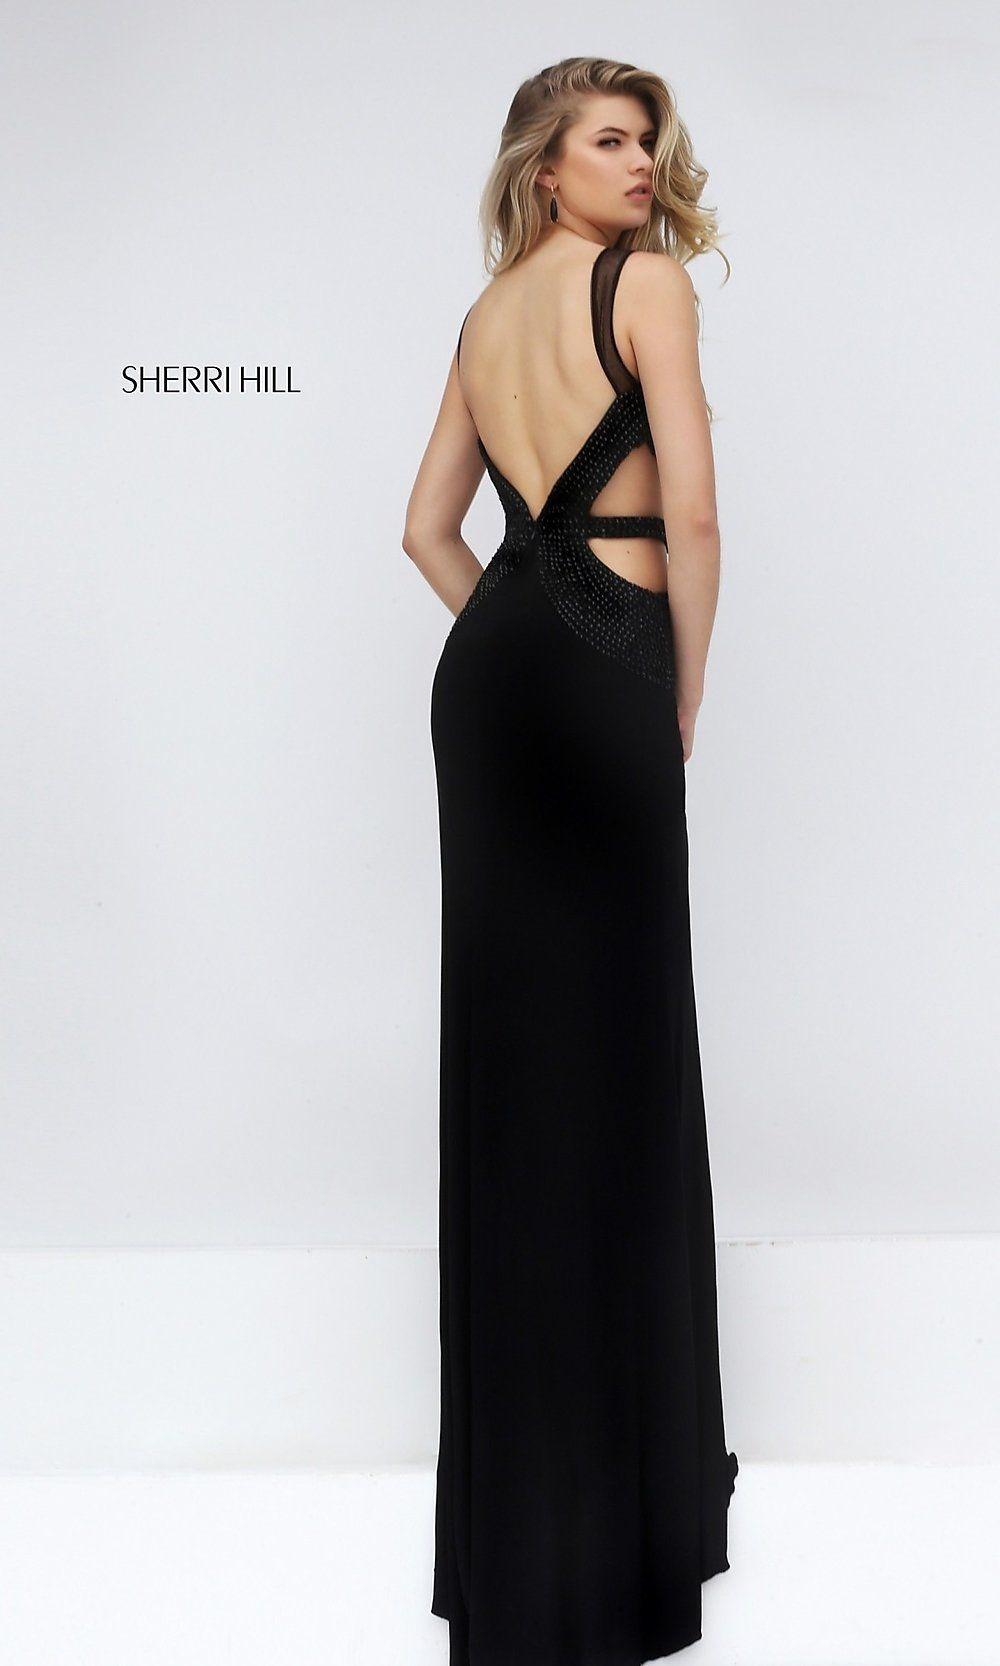 Sherri Hill Long Black Open Back Dress Promgirl Prom Dresses Formal Dresses Ball Dresses [ 1666 x 1000 Pixel ]